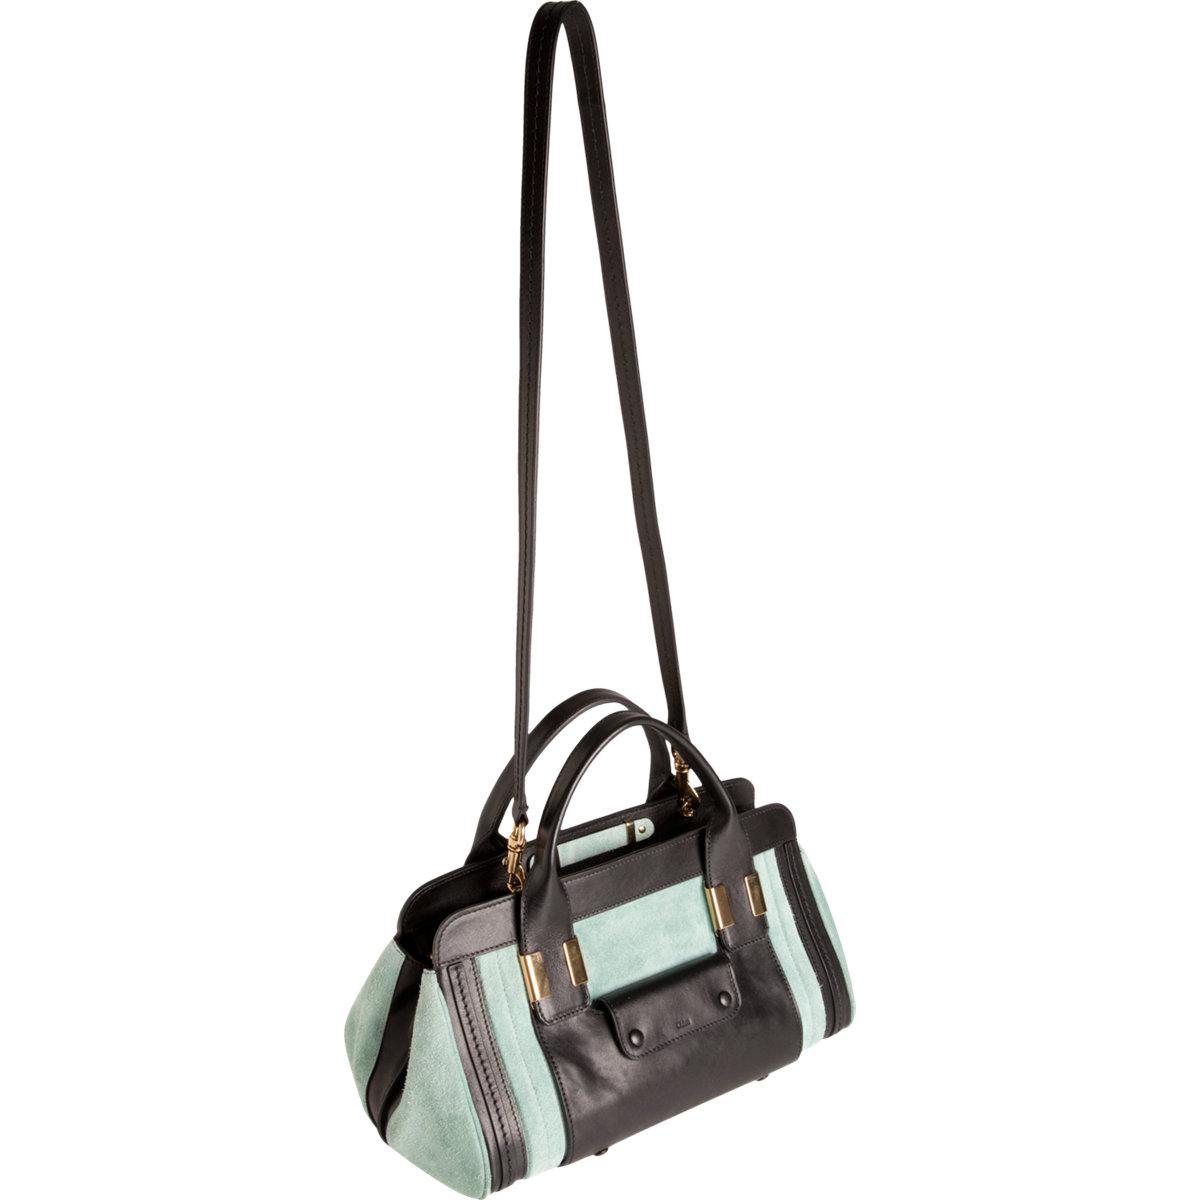 handbags chloe online - Chlo�� Colorblock Suede Small Alice Satchel in Blue (gold) | Lyst